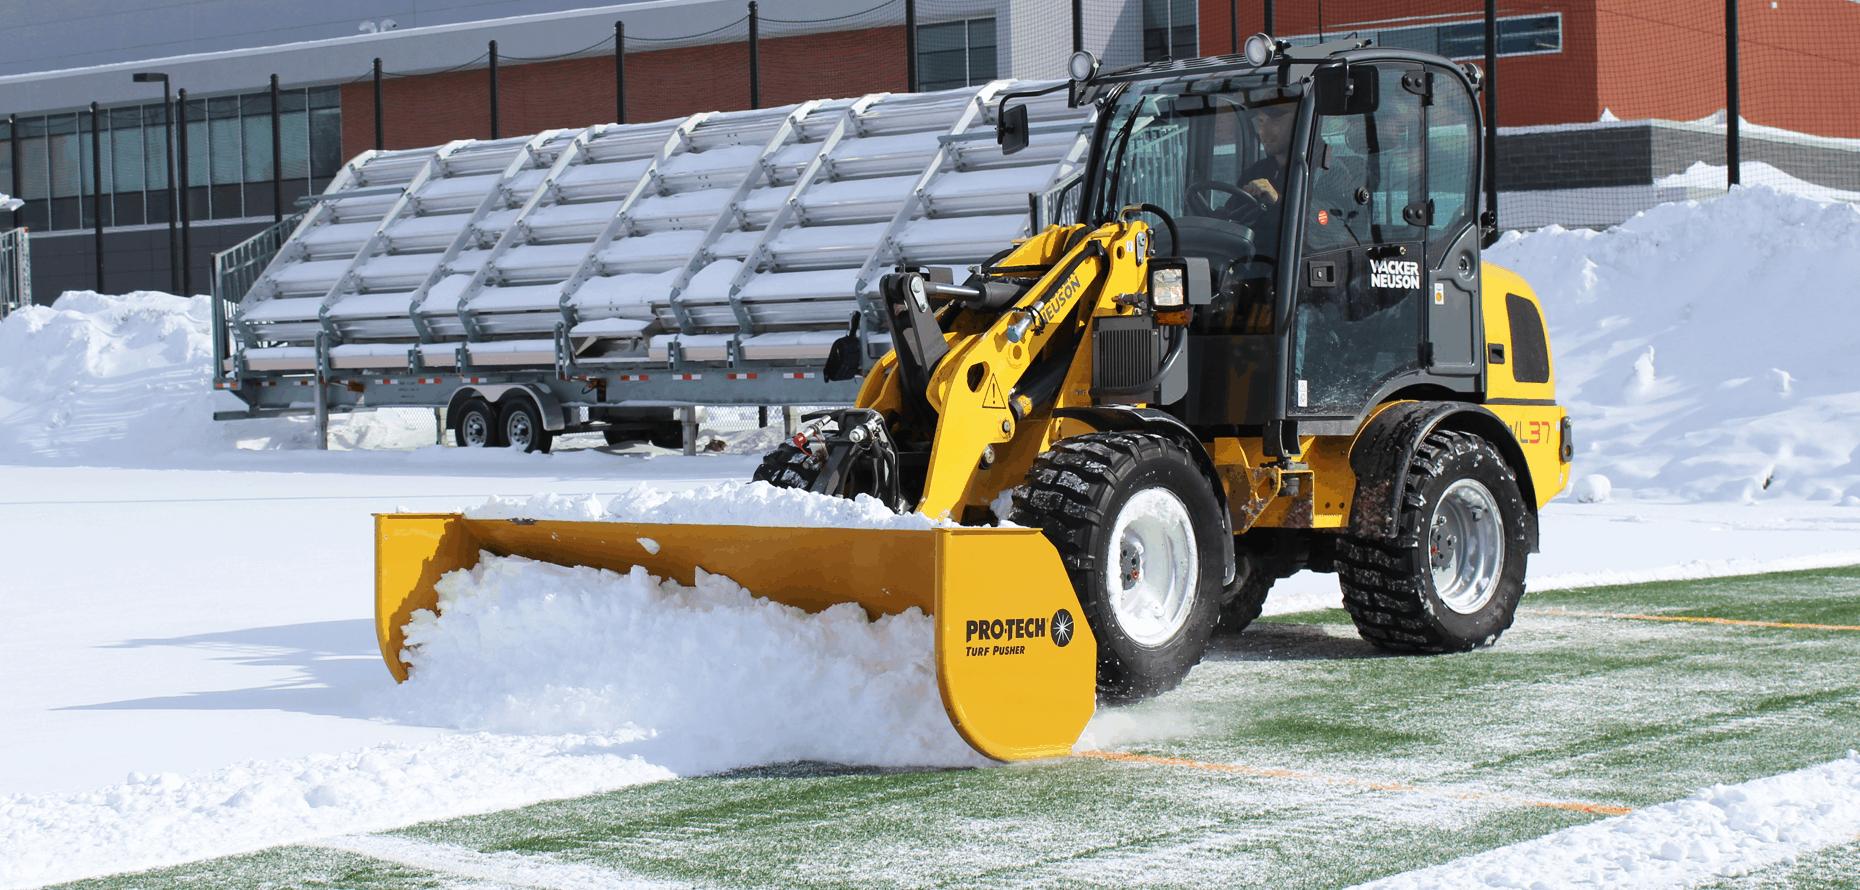 Turf Pusher Snow Plow For Turf Fields Pro Tech Sno Pusher